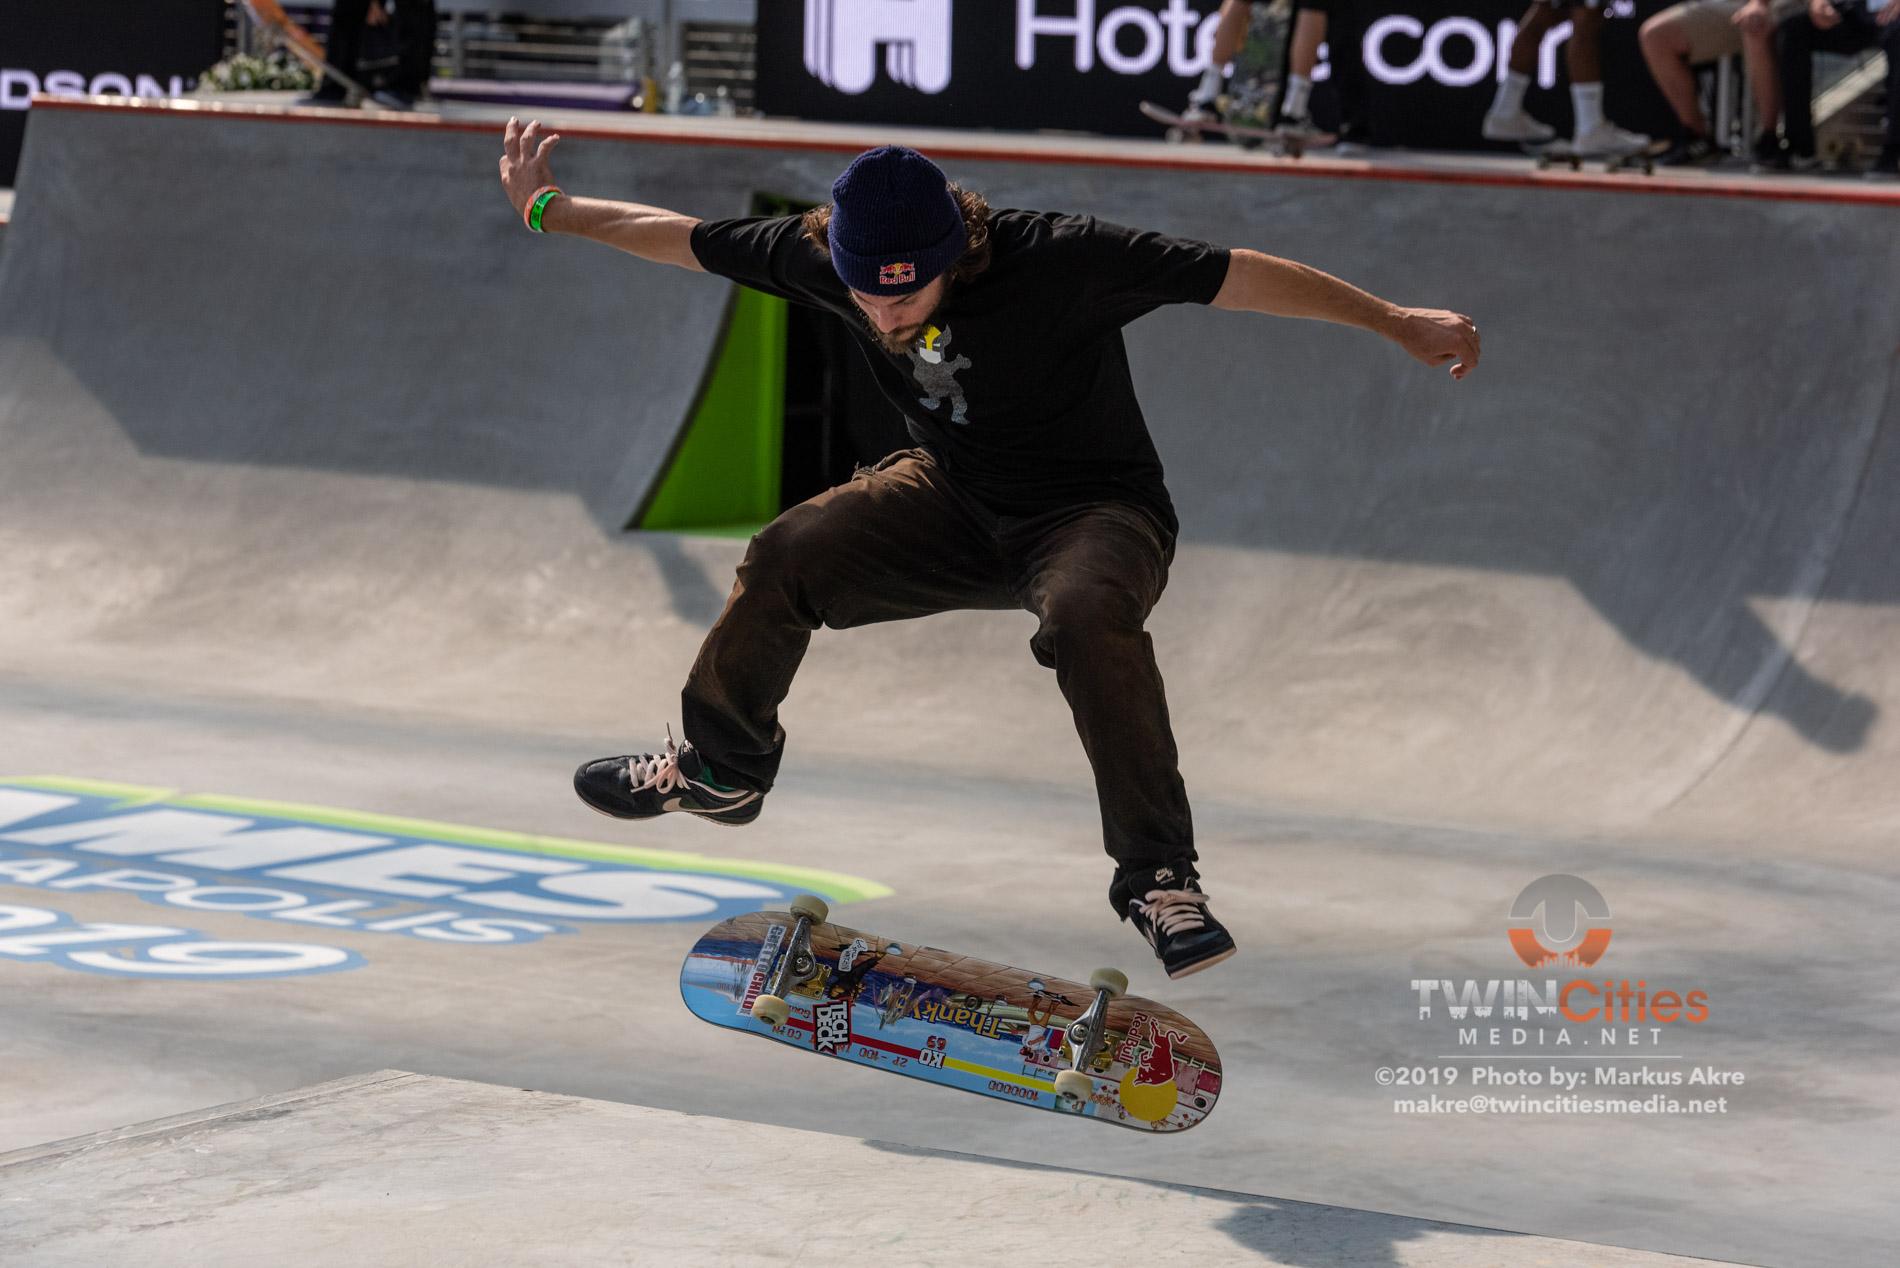 2019-X-Games-Day-1-Skate-Elims-3